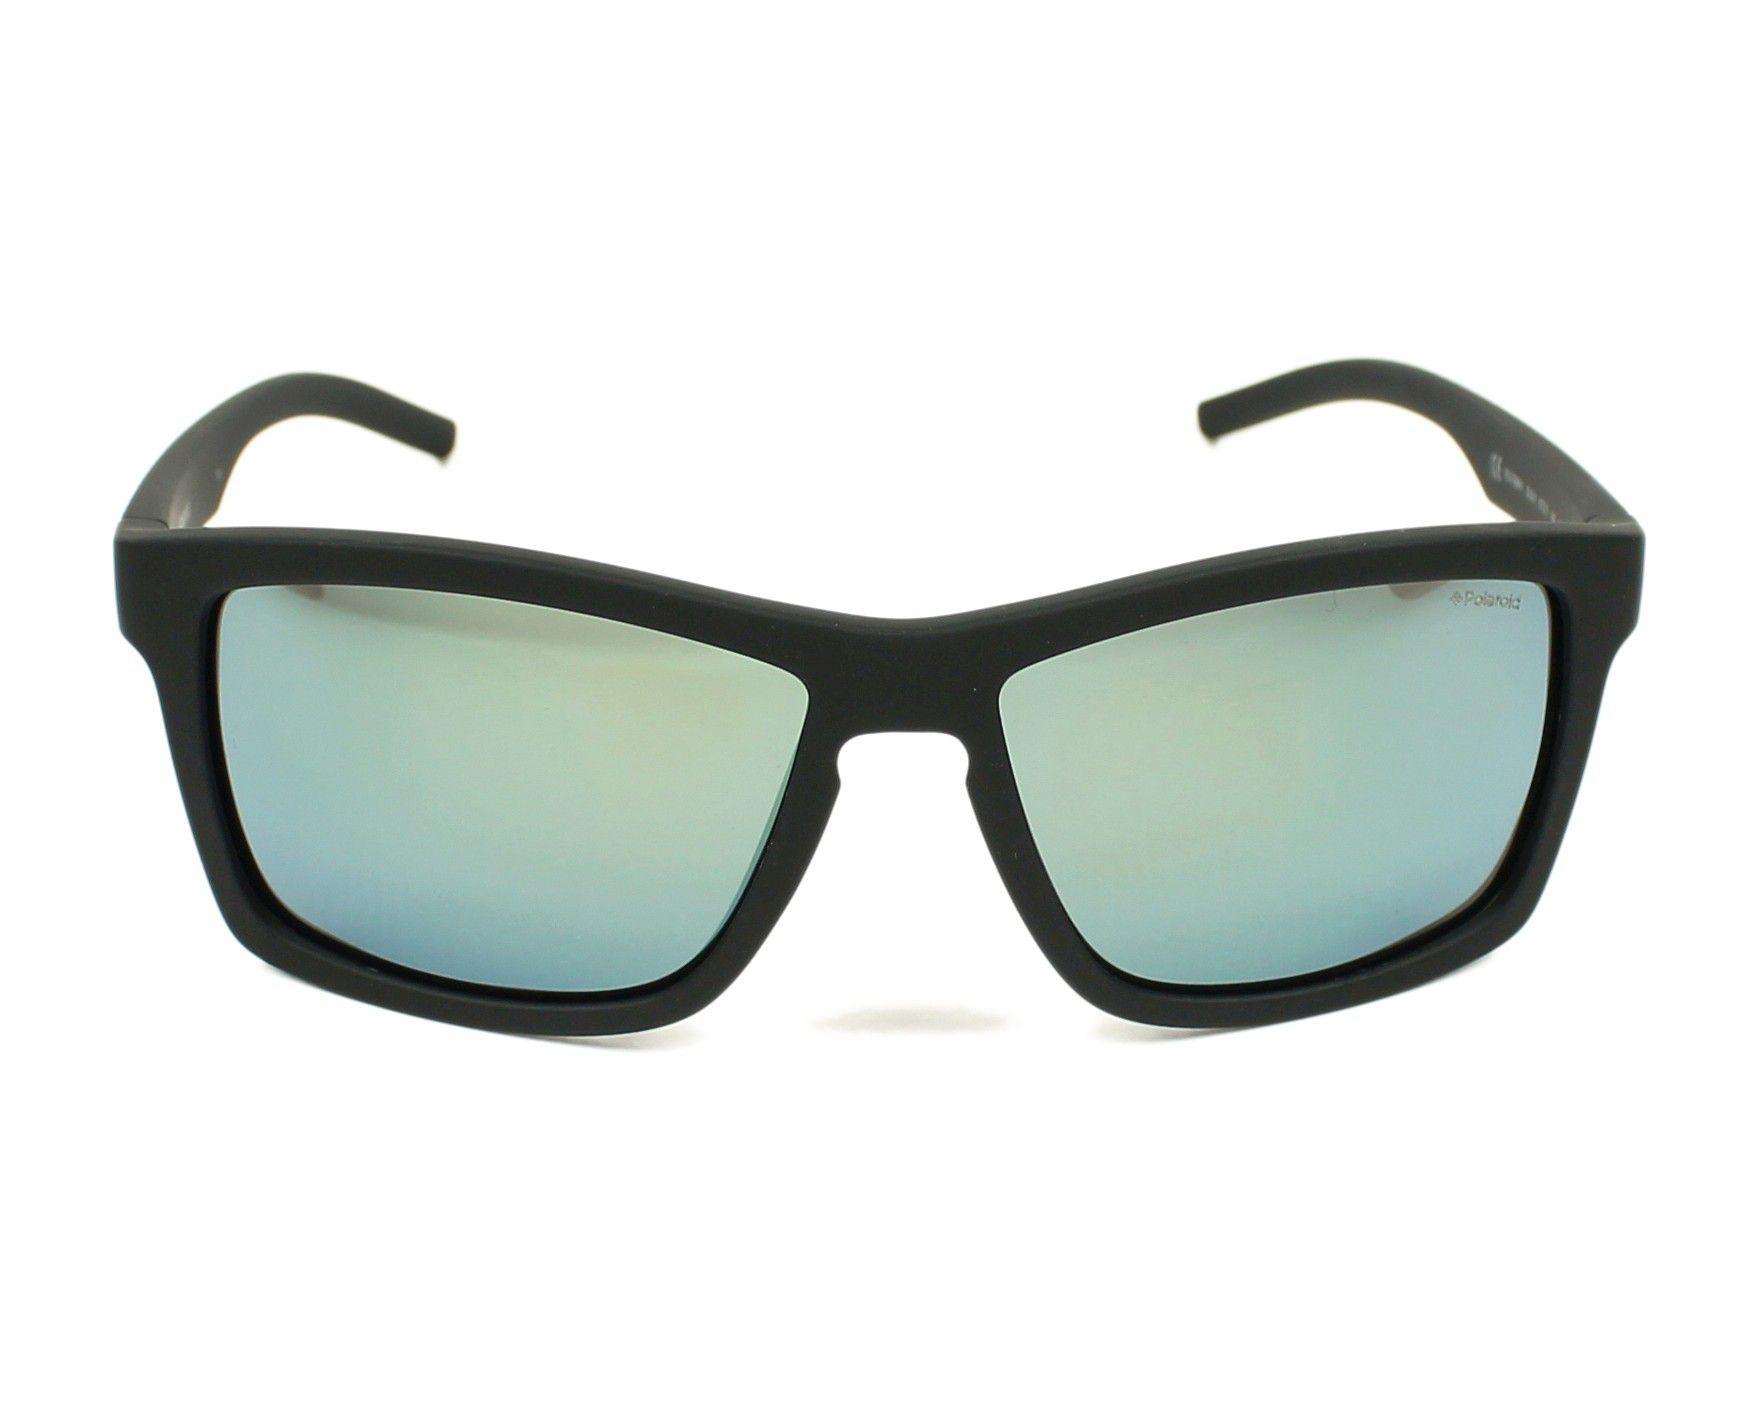 d688f465c0664 óculos de sol Polaroid Masculino Pld 7009 N DL5LM - Omega Ótica e ...